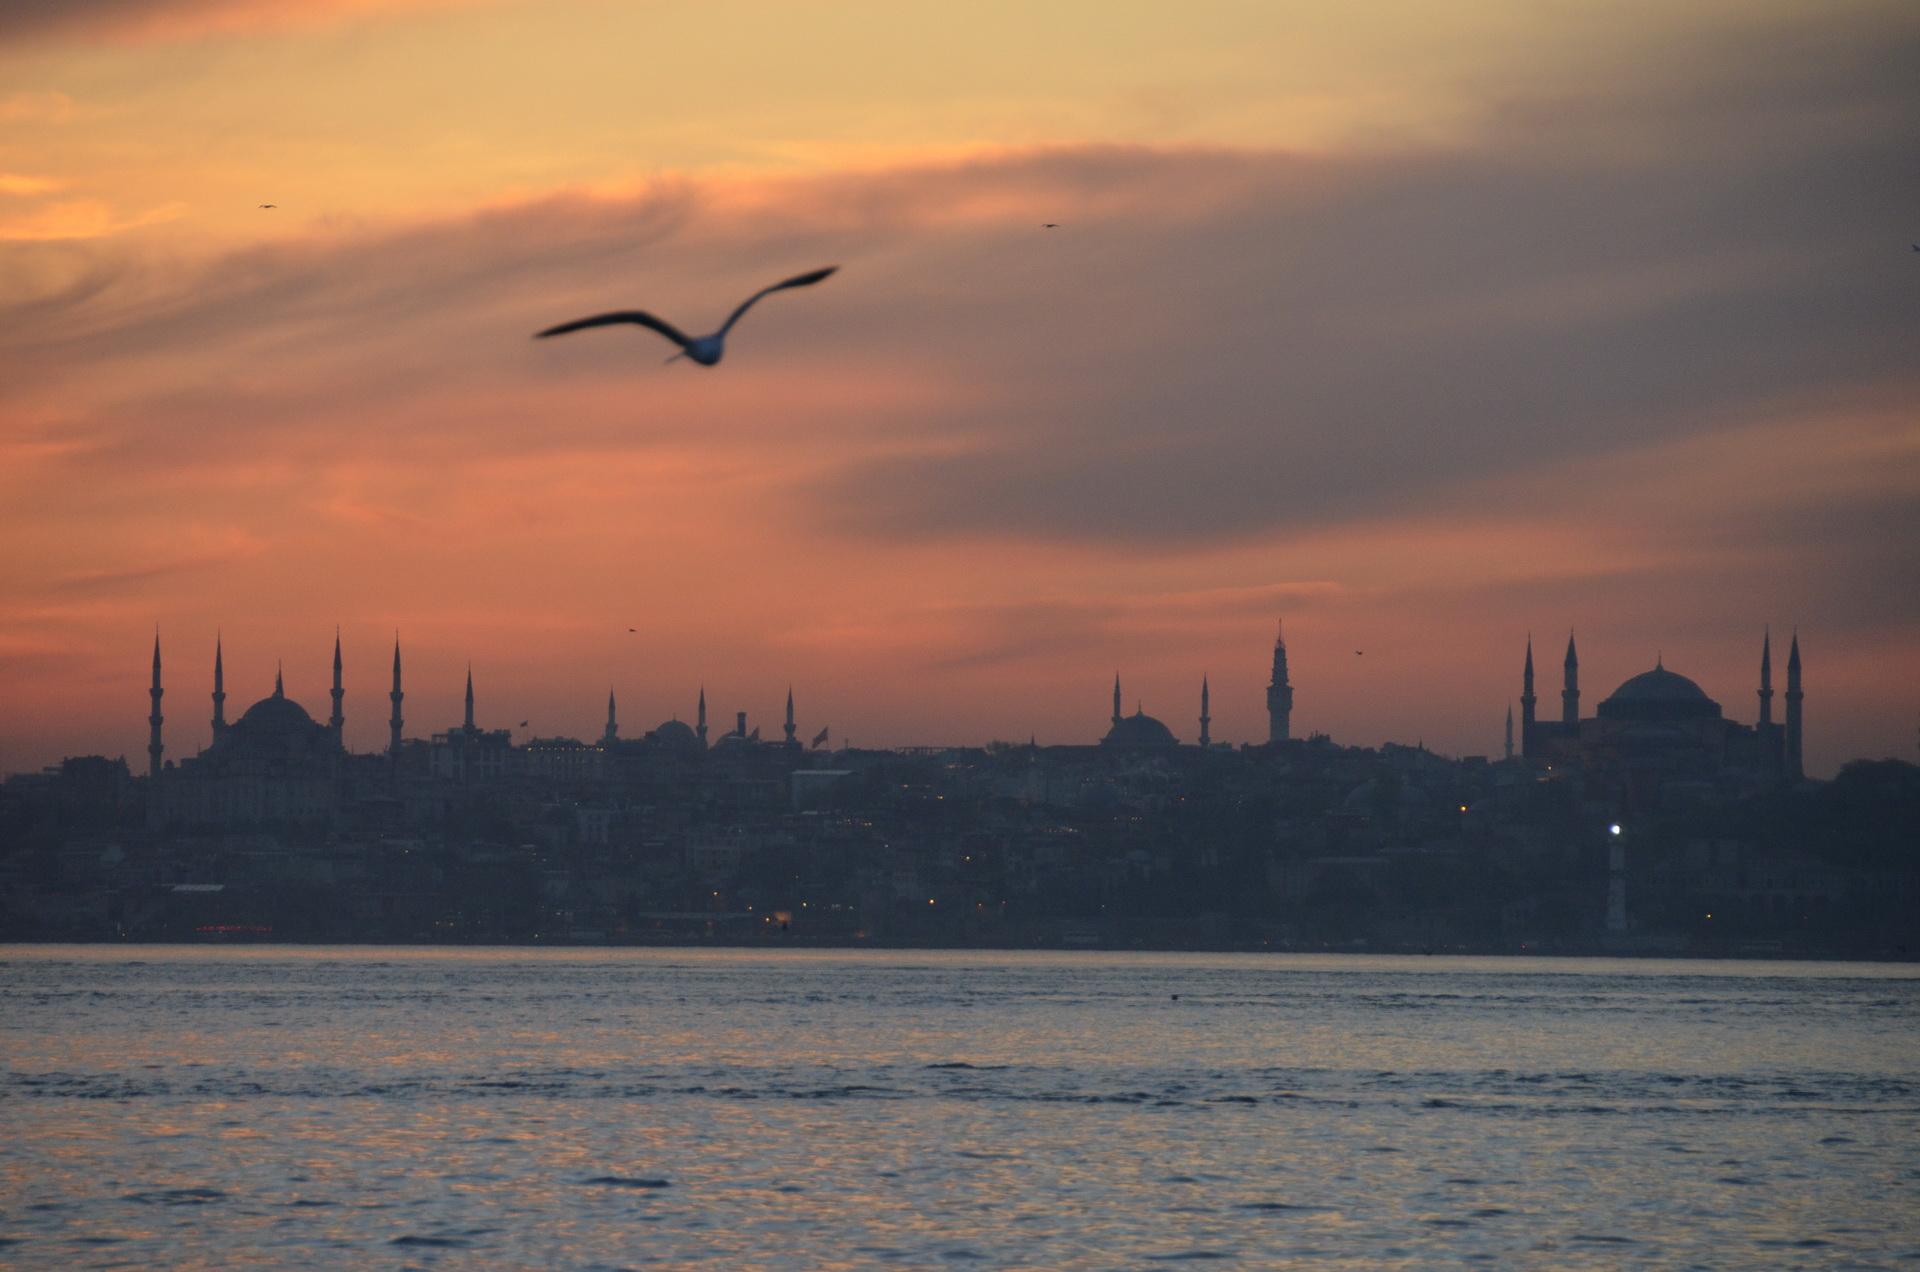 Travel tips for Turkey